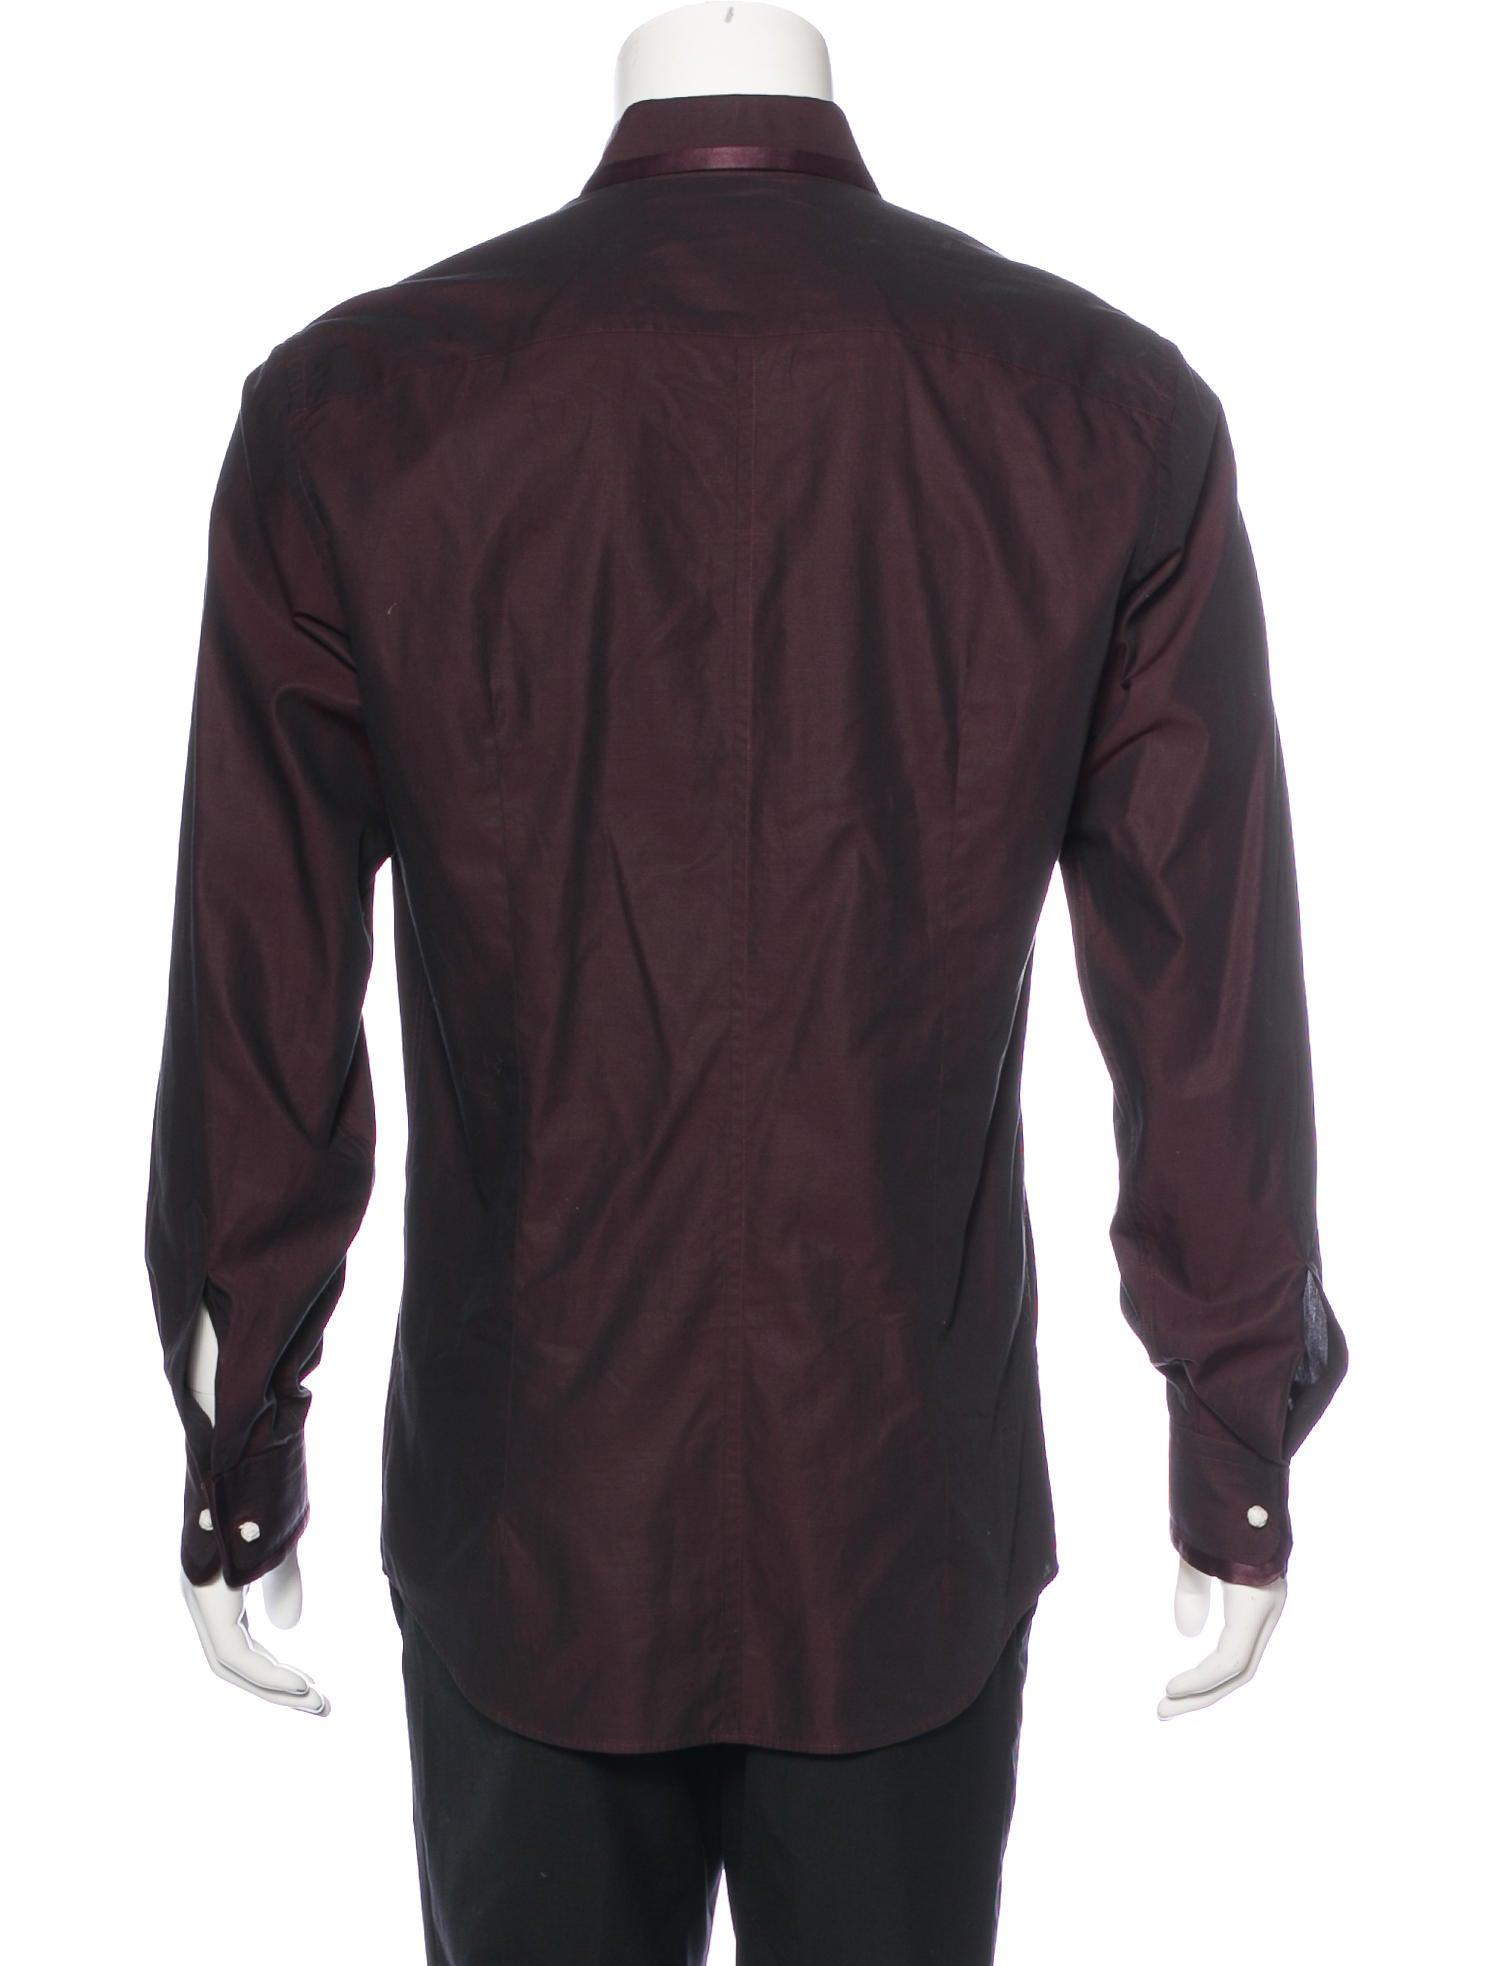 Dolce gabbana tailored fit dress shirt clothing for Tailored fit dress shirts